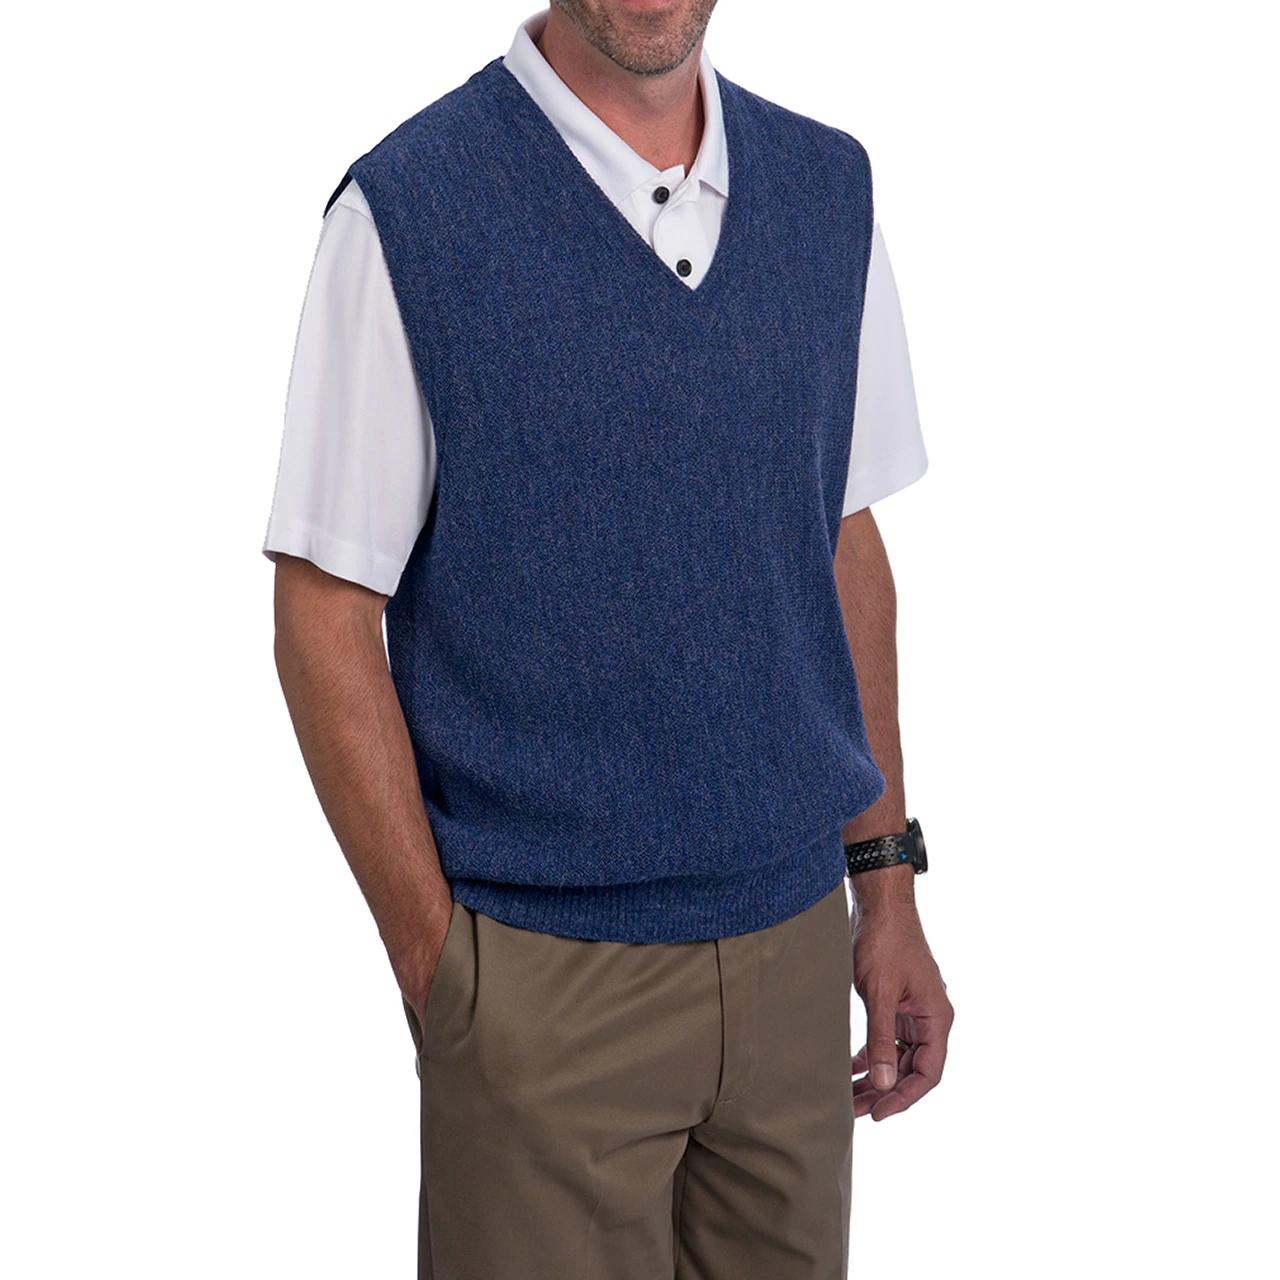 classic custom simple basic Design Men Pure Color v neck  100% wool vest golf boy sweater